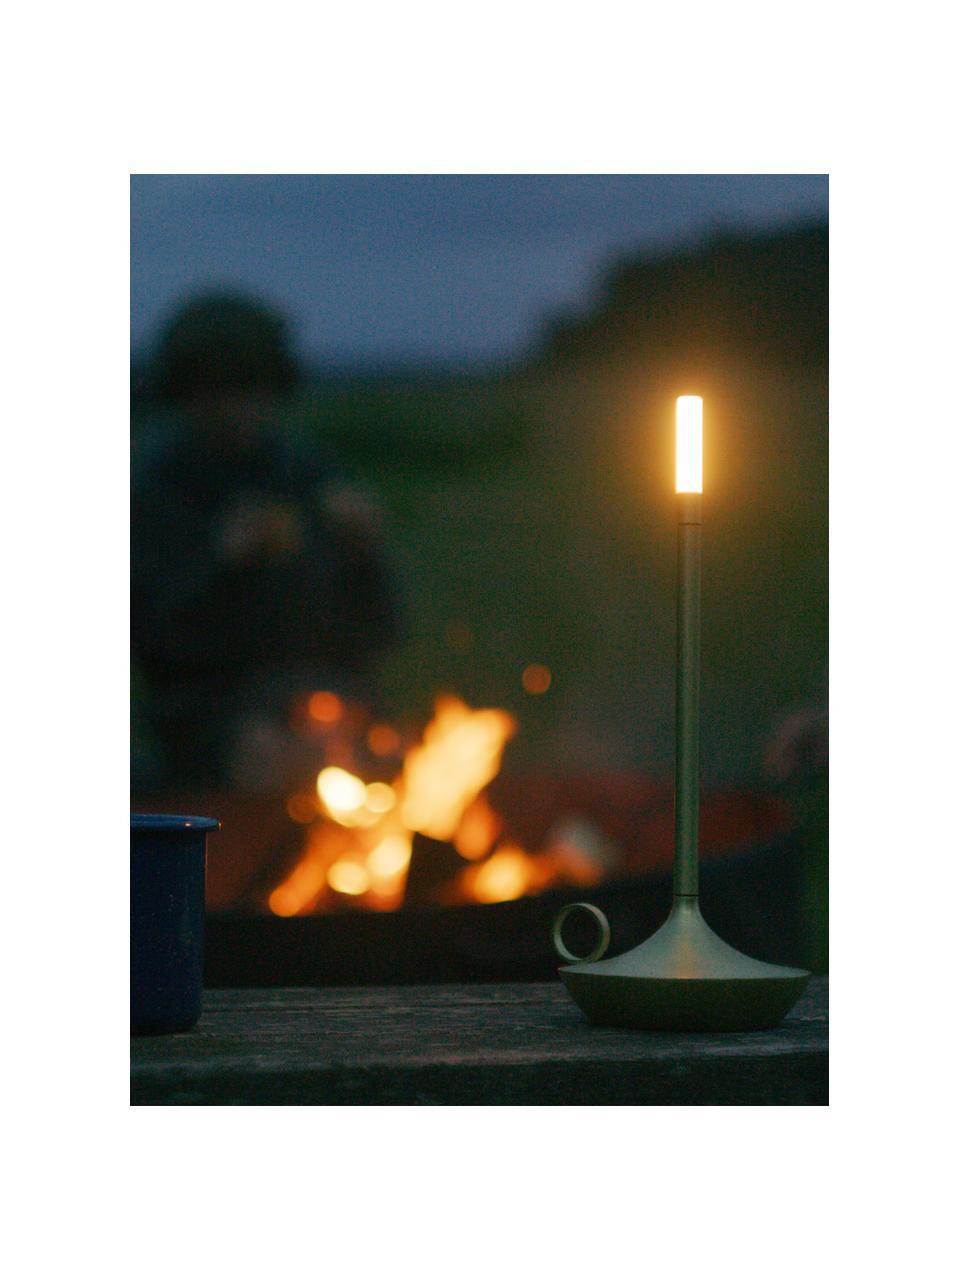 Kleine mobiele dimbare tafellamp Wick met touch functie, Lampvoet: aluminium, gerecycled en , Lampenkap: kunststof, Messingkleurig, Ø 12 x H 26 cm